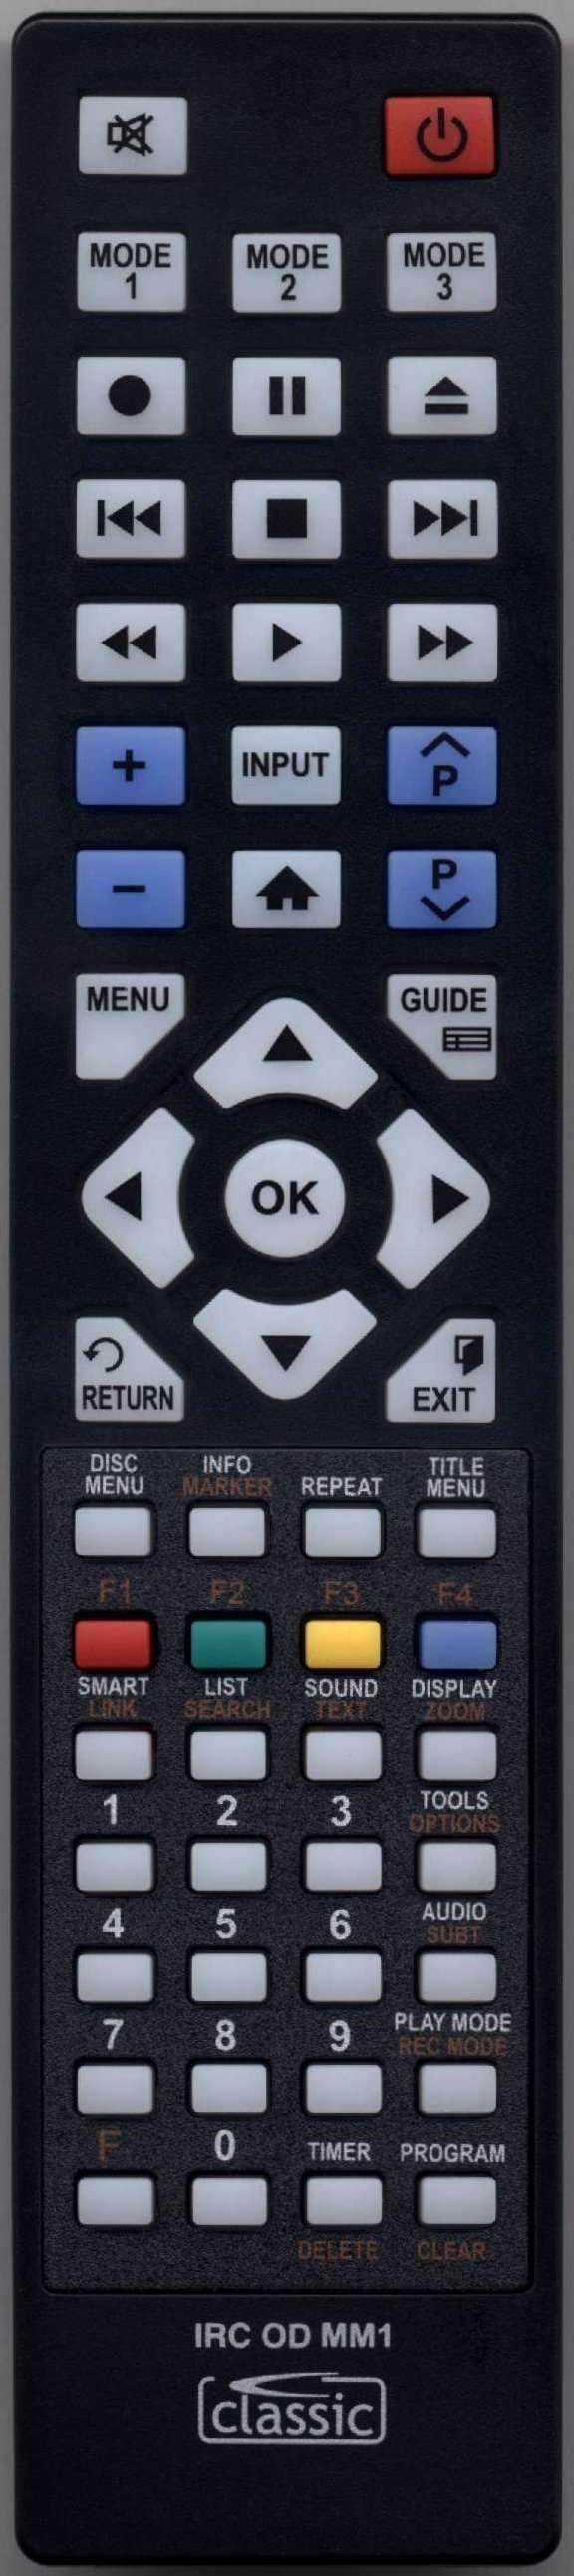 SAMSUNG BD-H8900M Remote Control Alternative